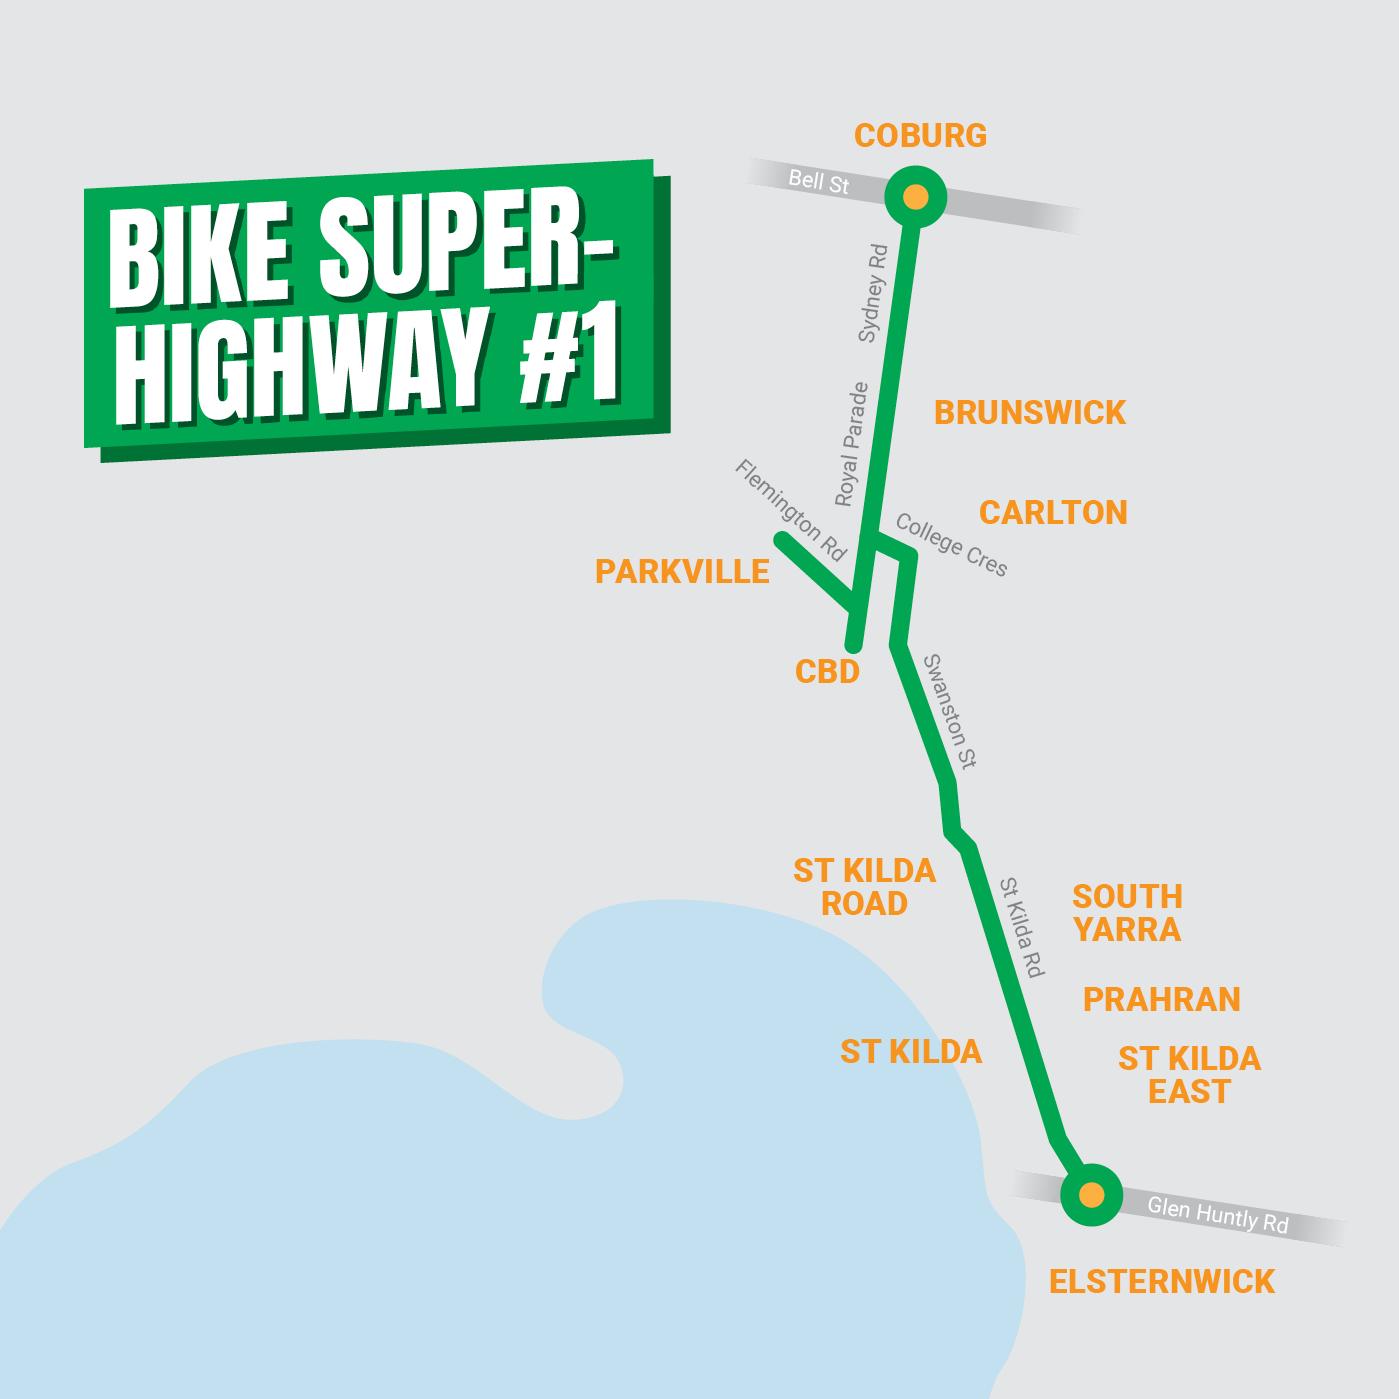 Bike Superhighway #1